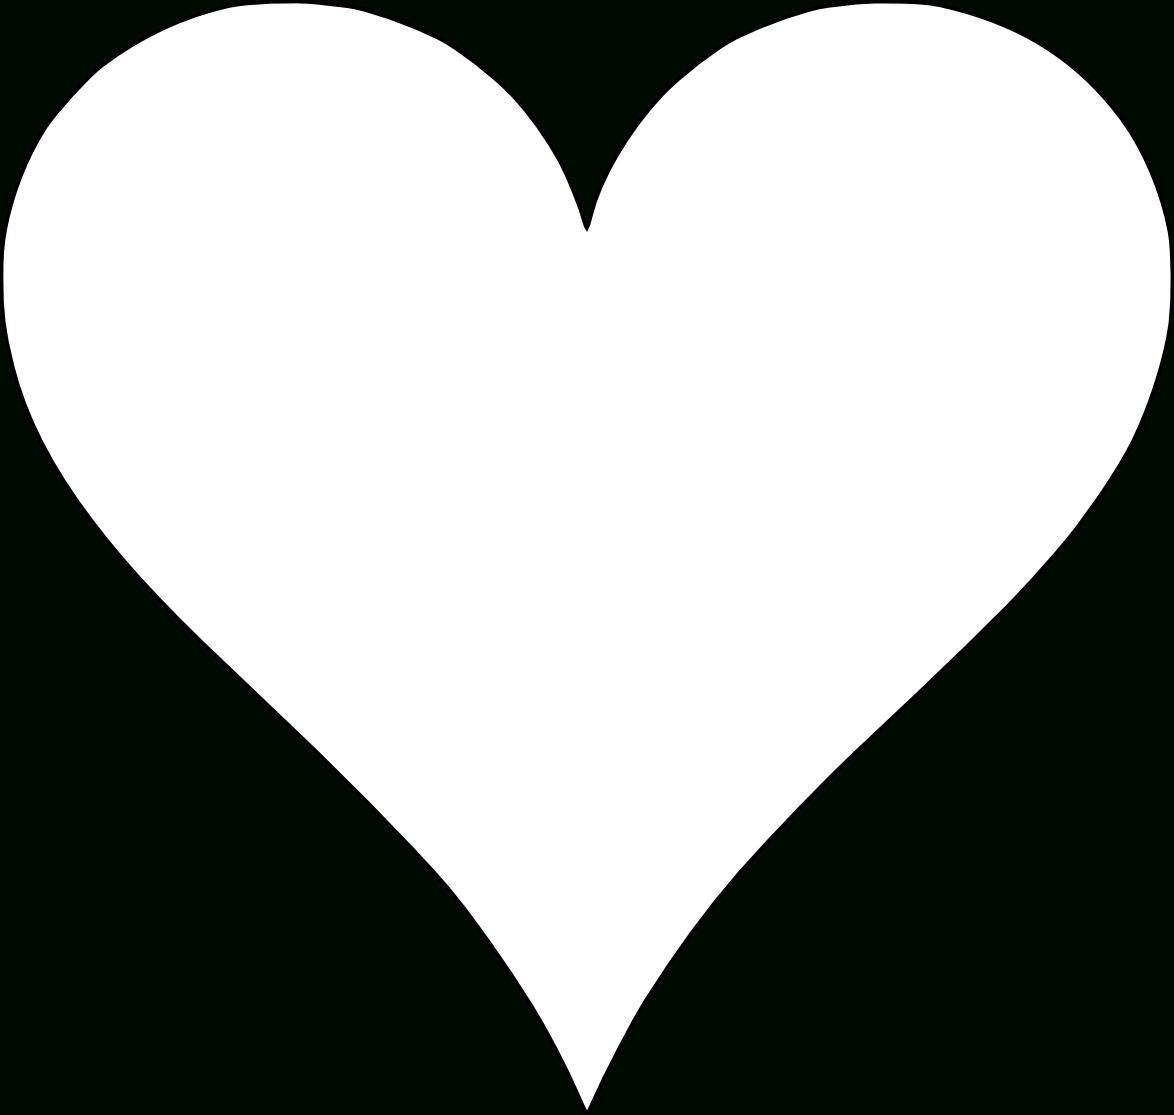 6 Free Printable Heart Templates | Heart Template, Printable Hearts - Free Printable Hearts